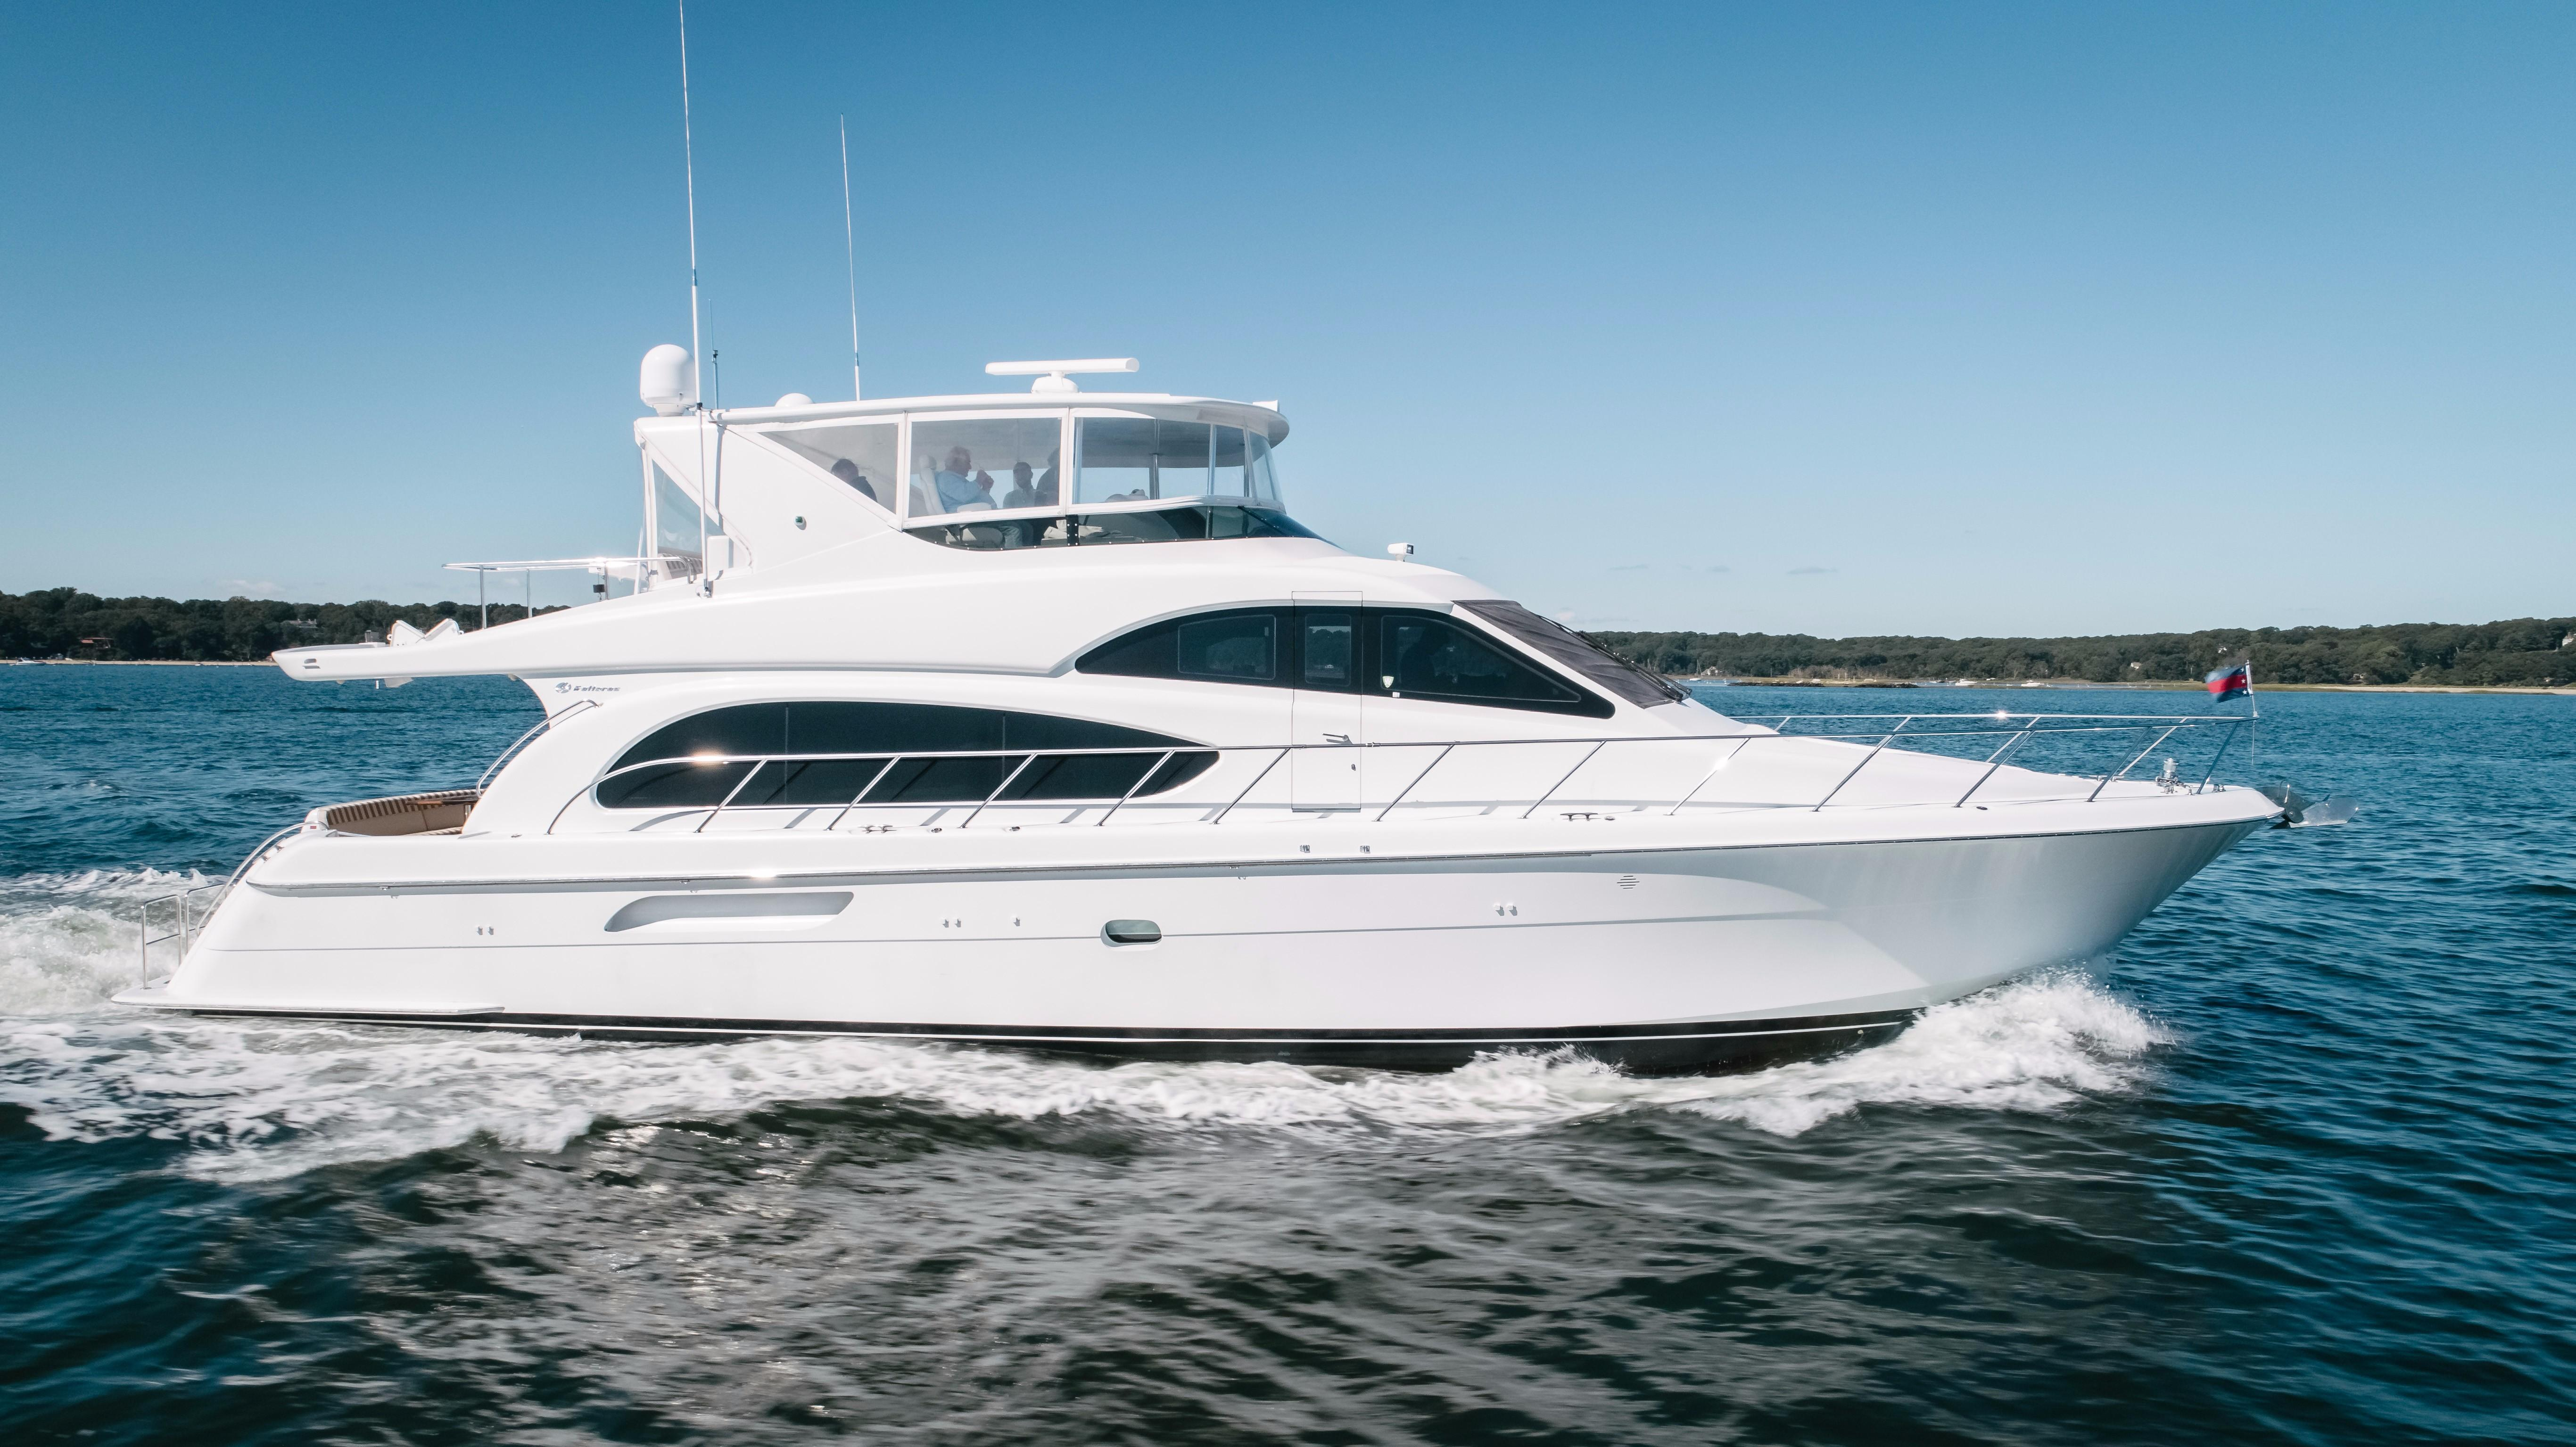 Cruiser Yachts Keypad Wiring Diagram - DIY Enthusiasts Wiring Diagrams •